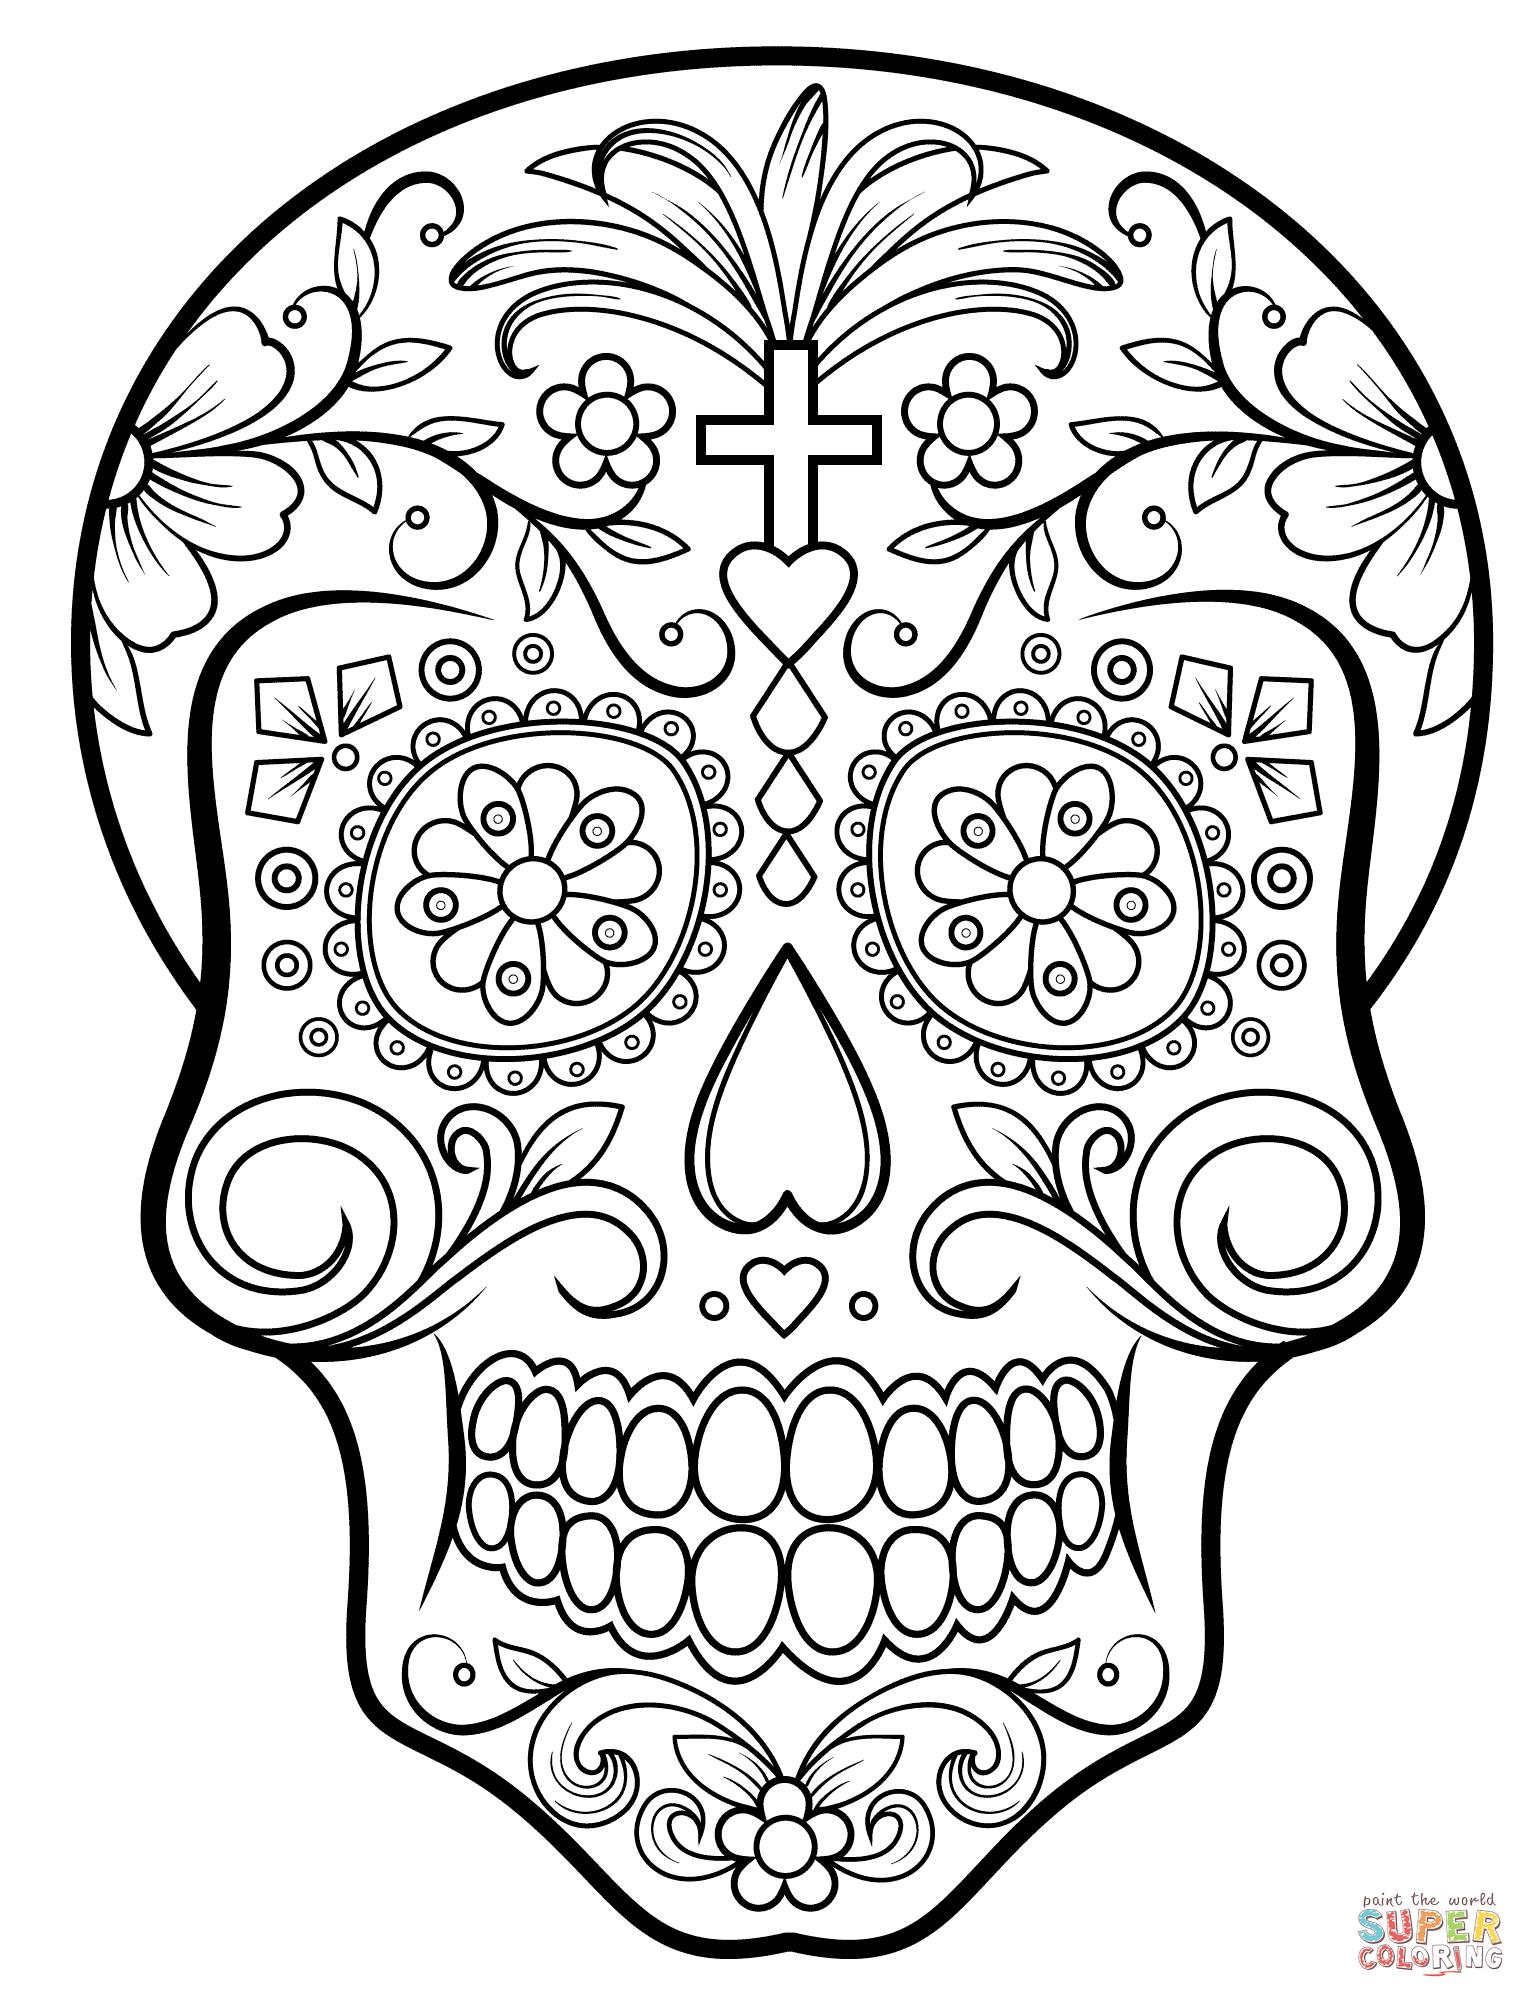 Sugar Skulls Coloring Pages   Free Coloring Pages - Free Printable Sugar Skull Coloring Pages